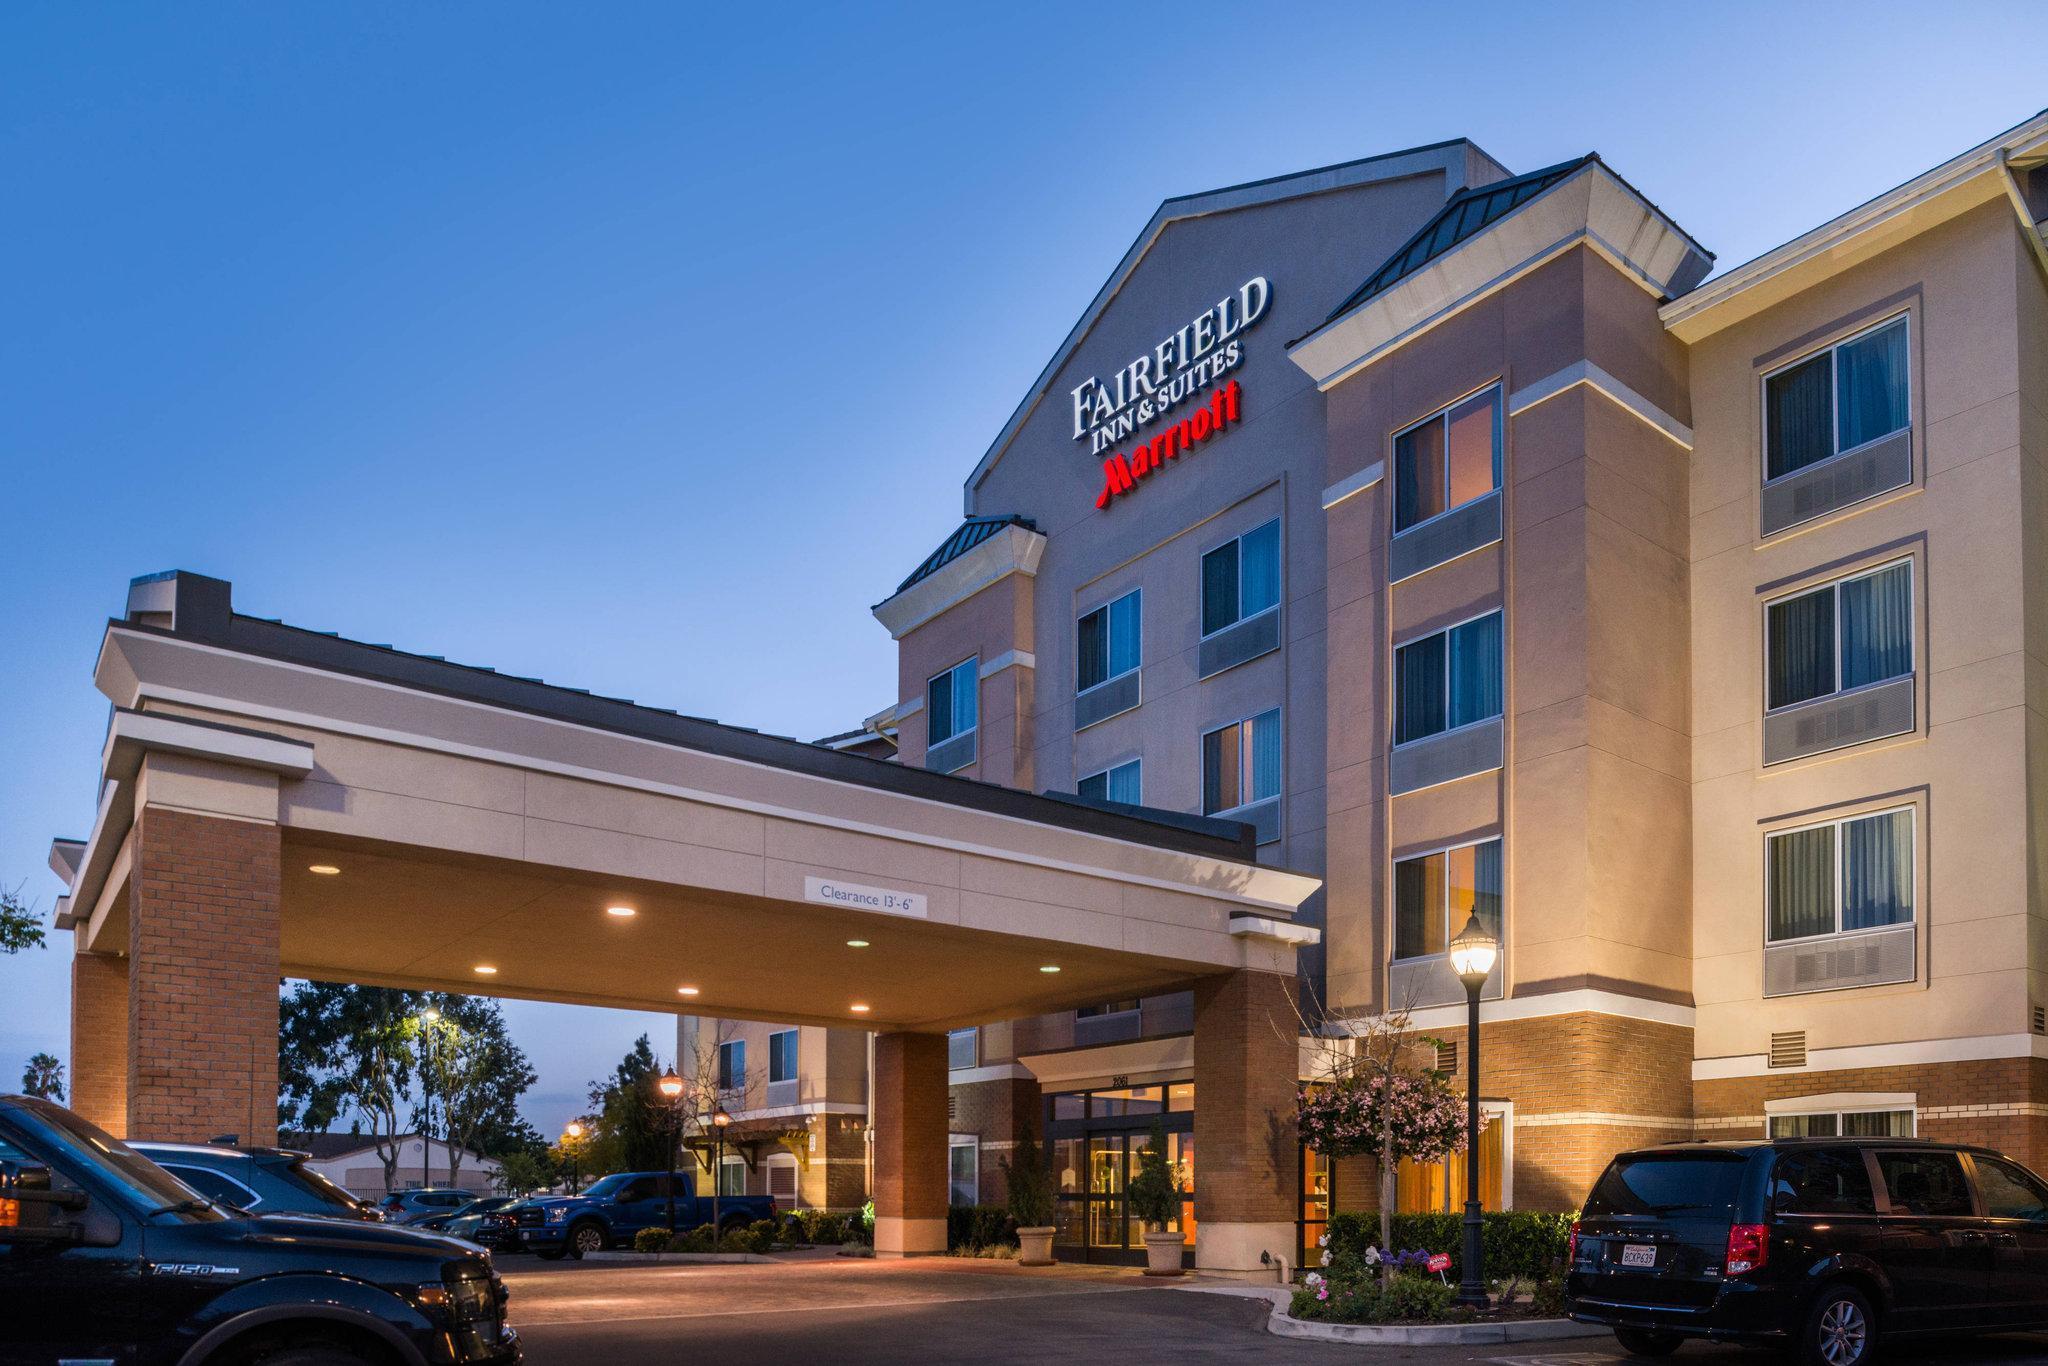 Fairfield Inn And Suites Santa Maria